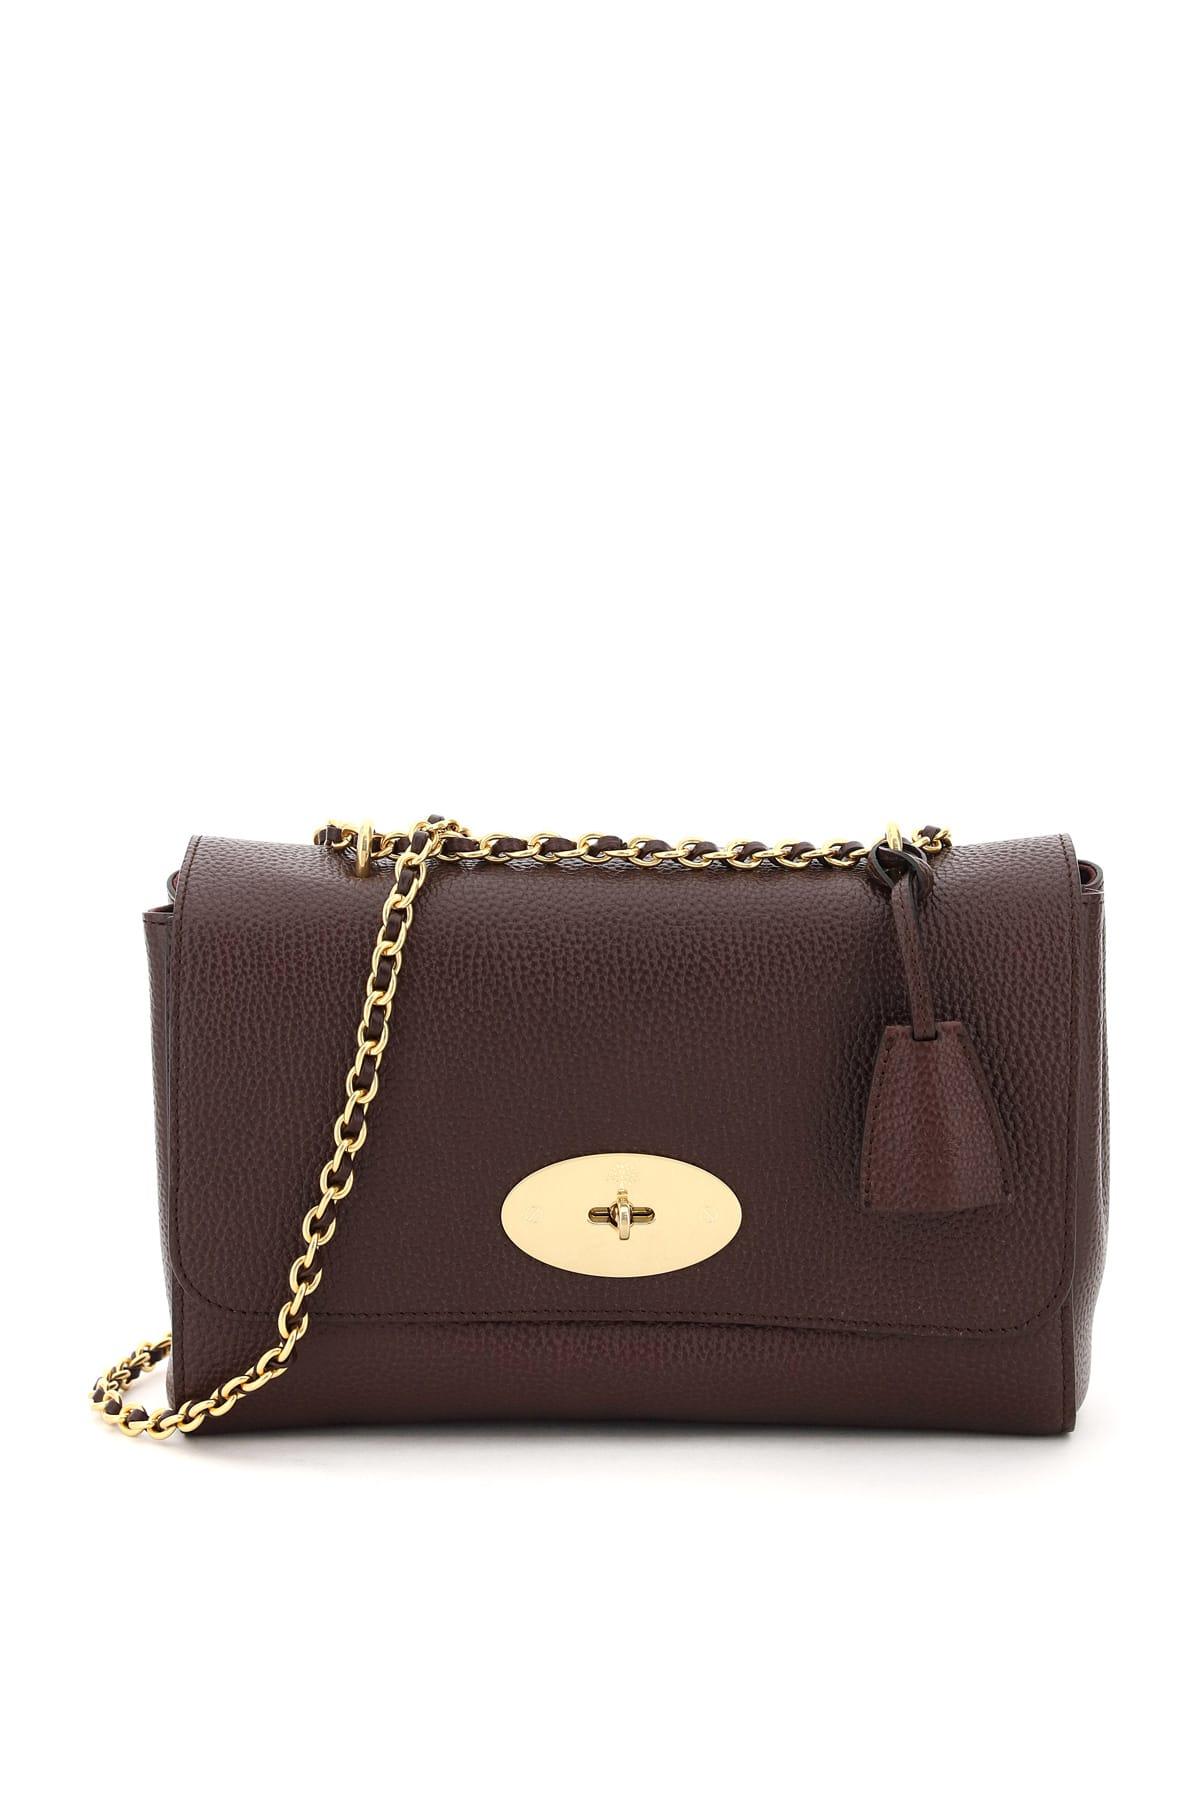 Mulberry Lily Medium Bag